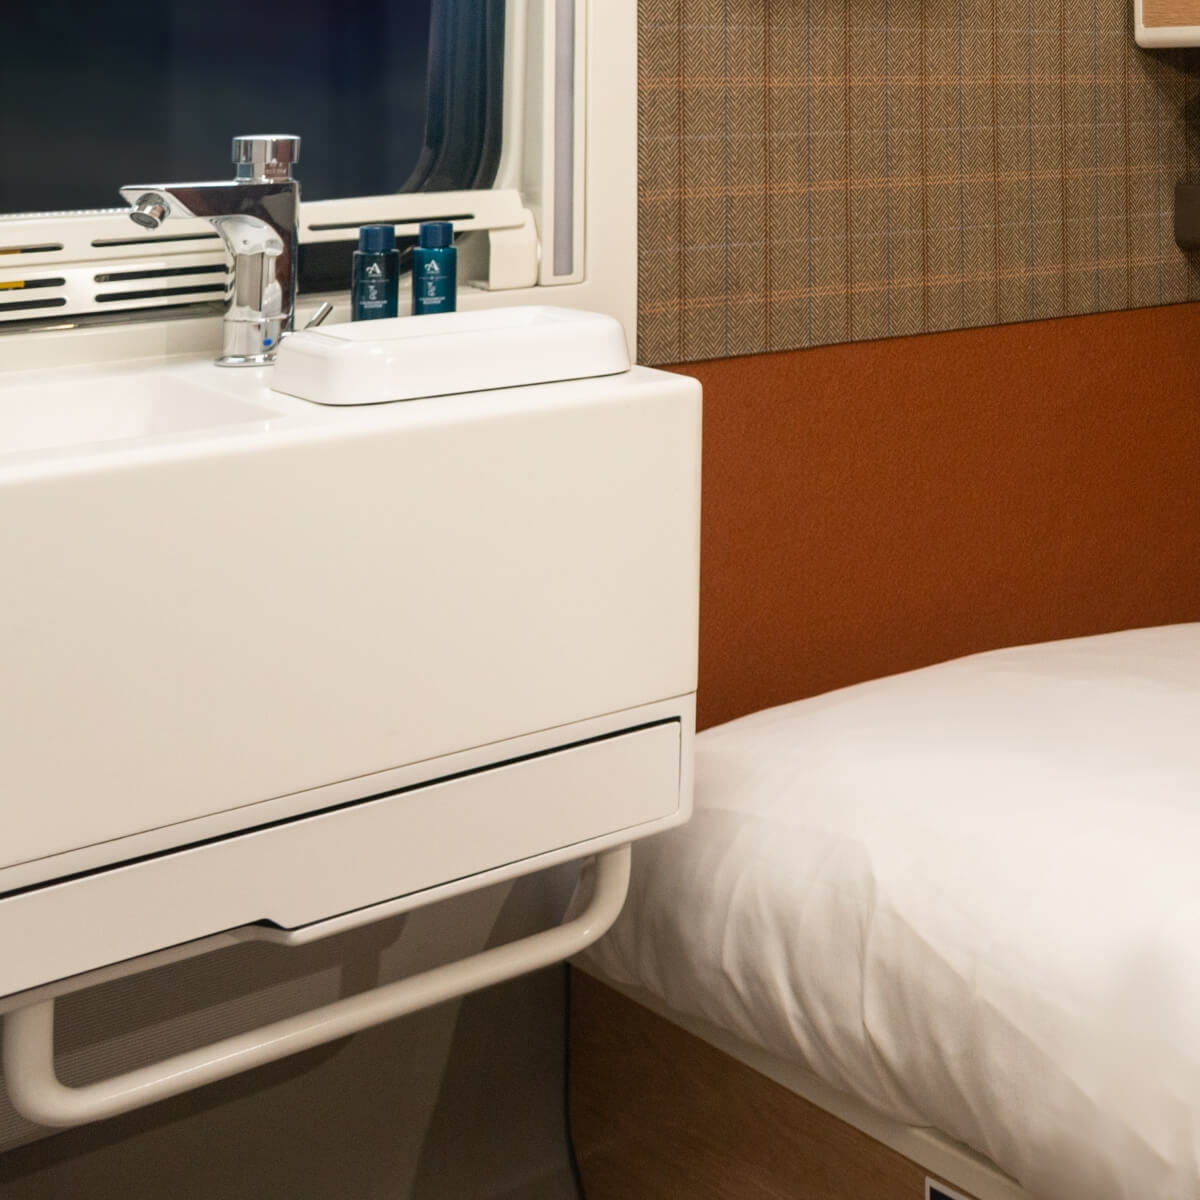 Caledonian Sleeper accommodation